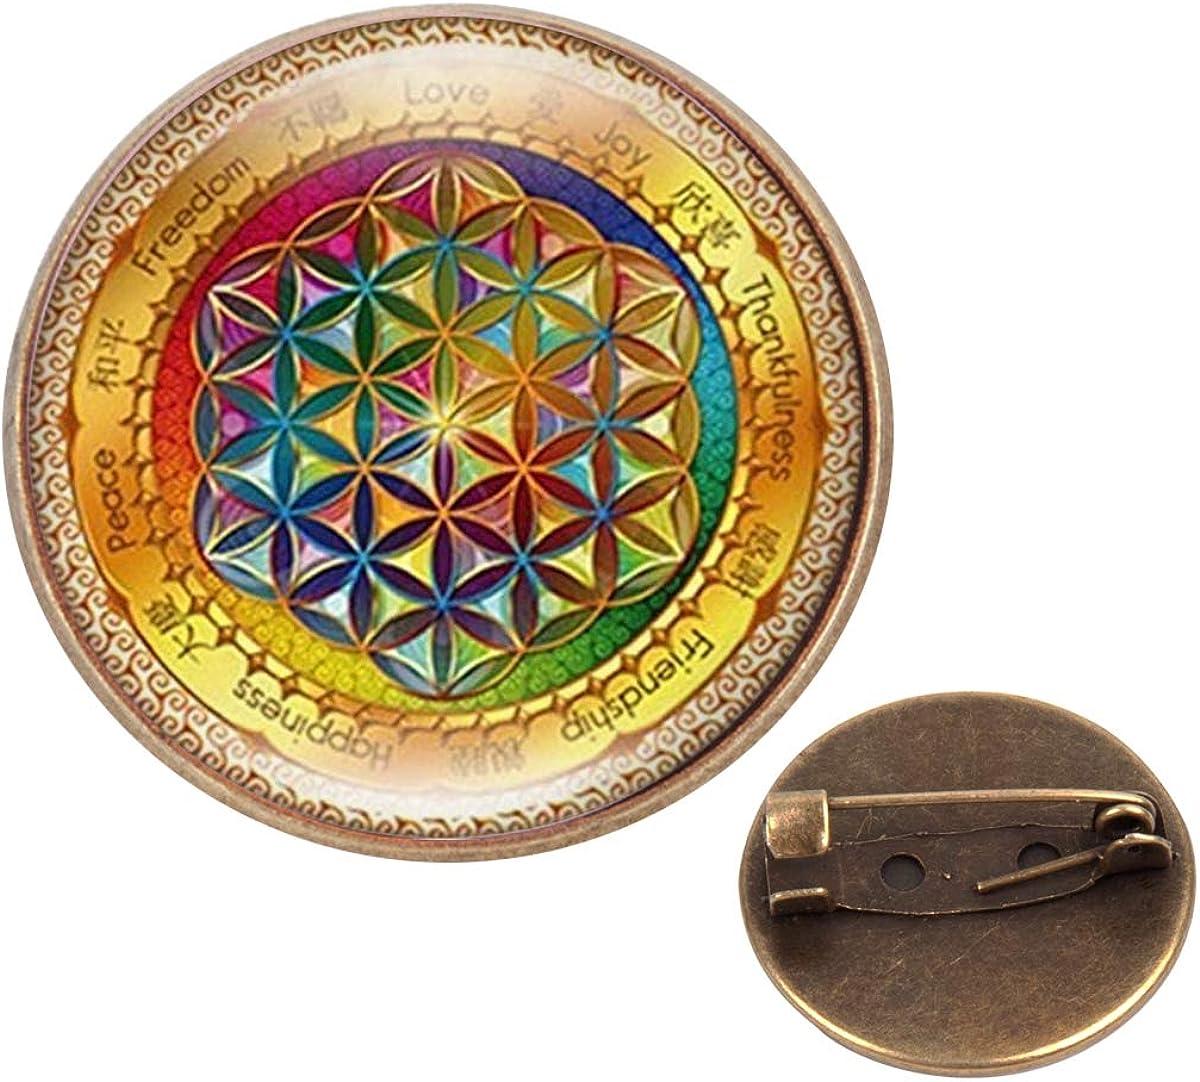 Pinback Buttons Badges Pins Geometric Free Picture Mandala Flowers Lapel Pin Brooch Clip Trendy Accessory Jacket T-Shirt Bag Hat Shoe